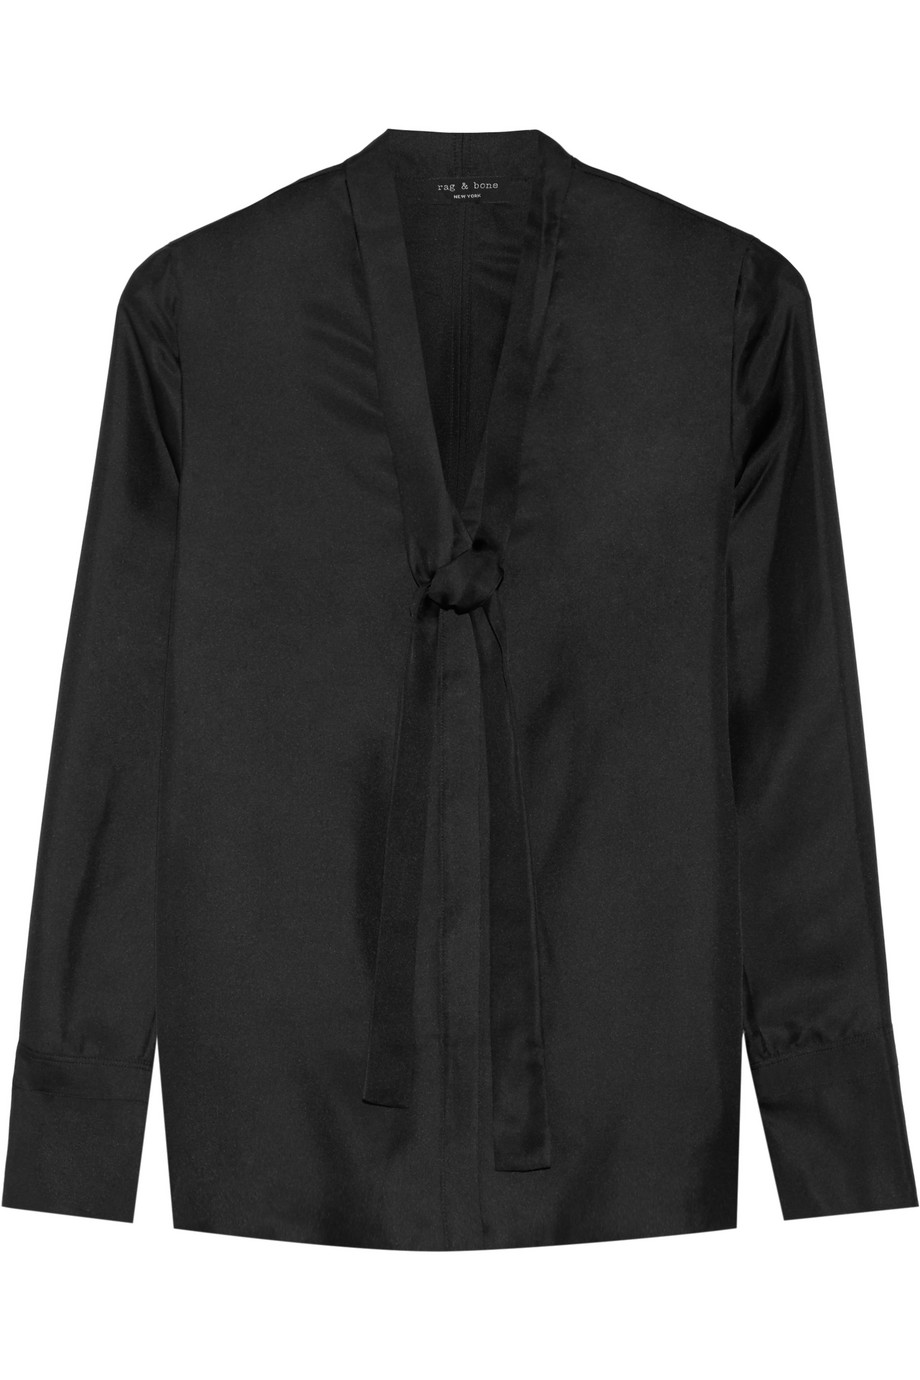 Rag & Bone Florence Pussy-Bow Silk-Satin Twill Shirt, Black, Women's, Size: 0